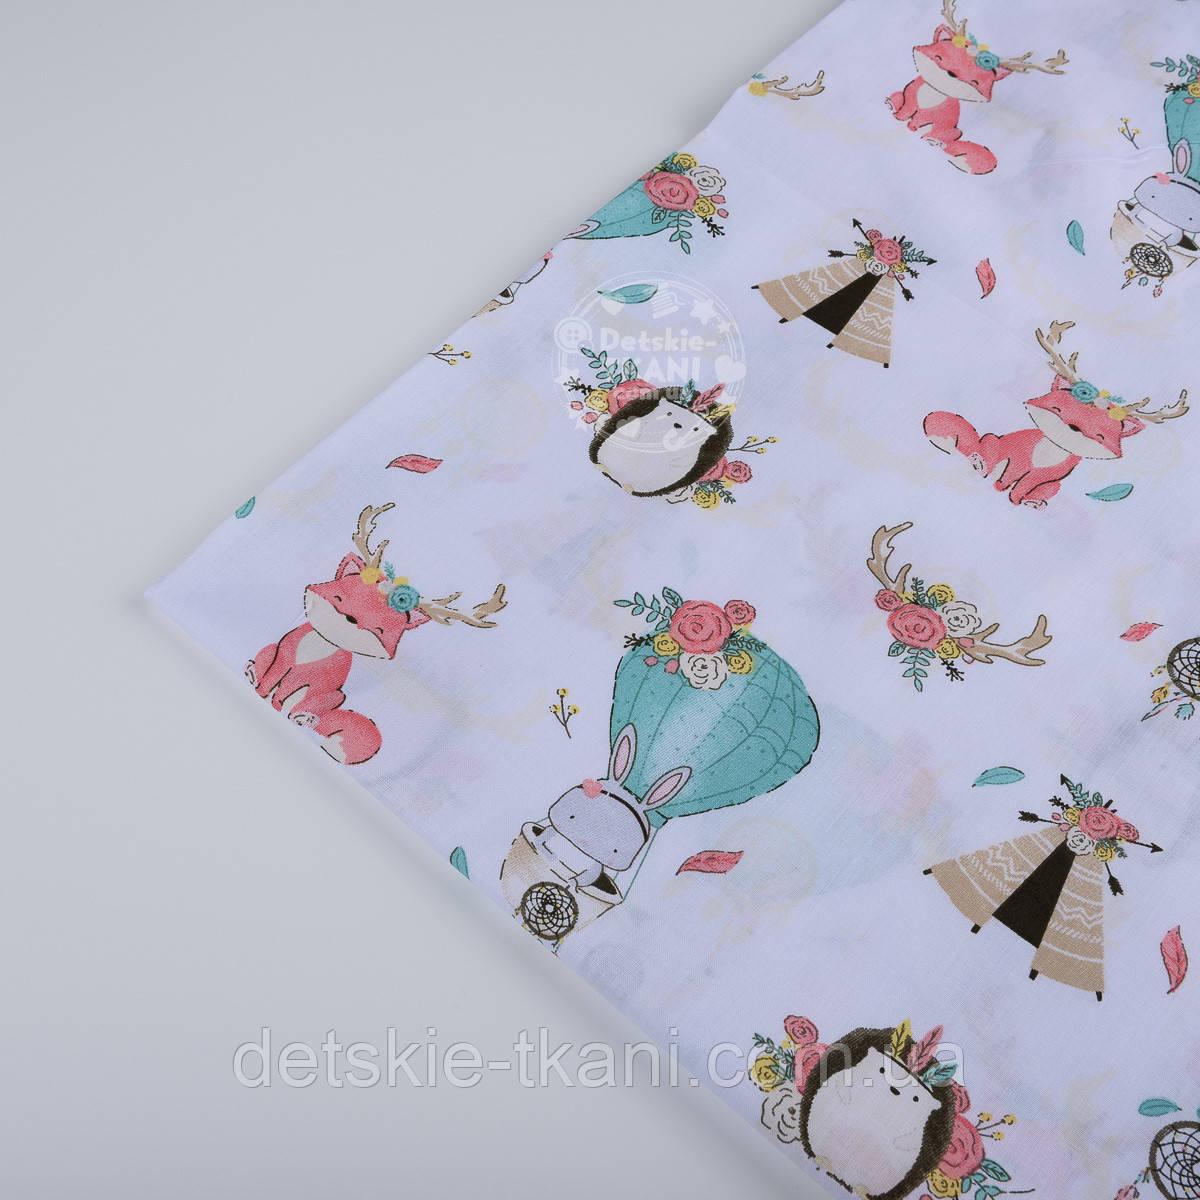 "Отрез ткани ""Лисички и роги оленя мятно-розового цвета"" на белом фоне, № 1280а"